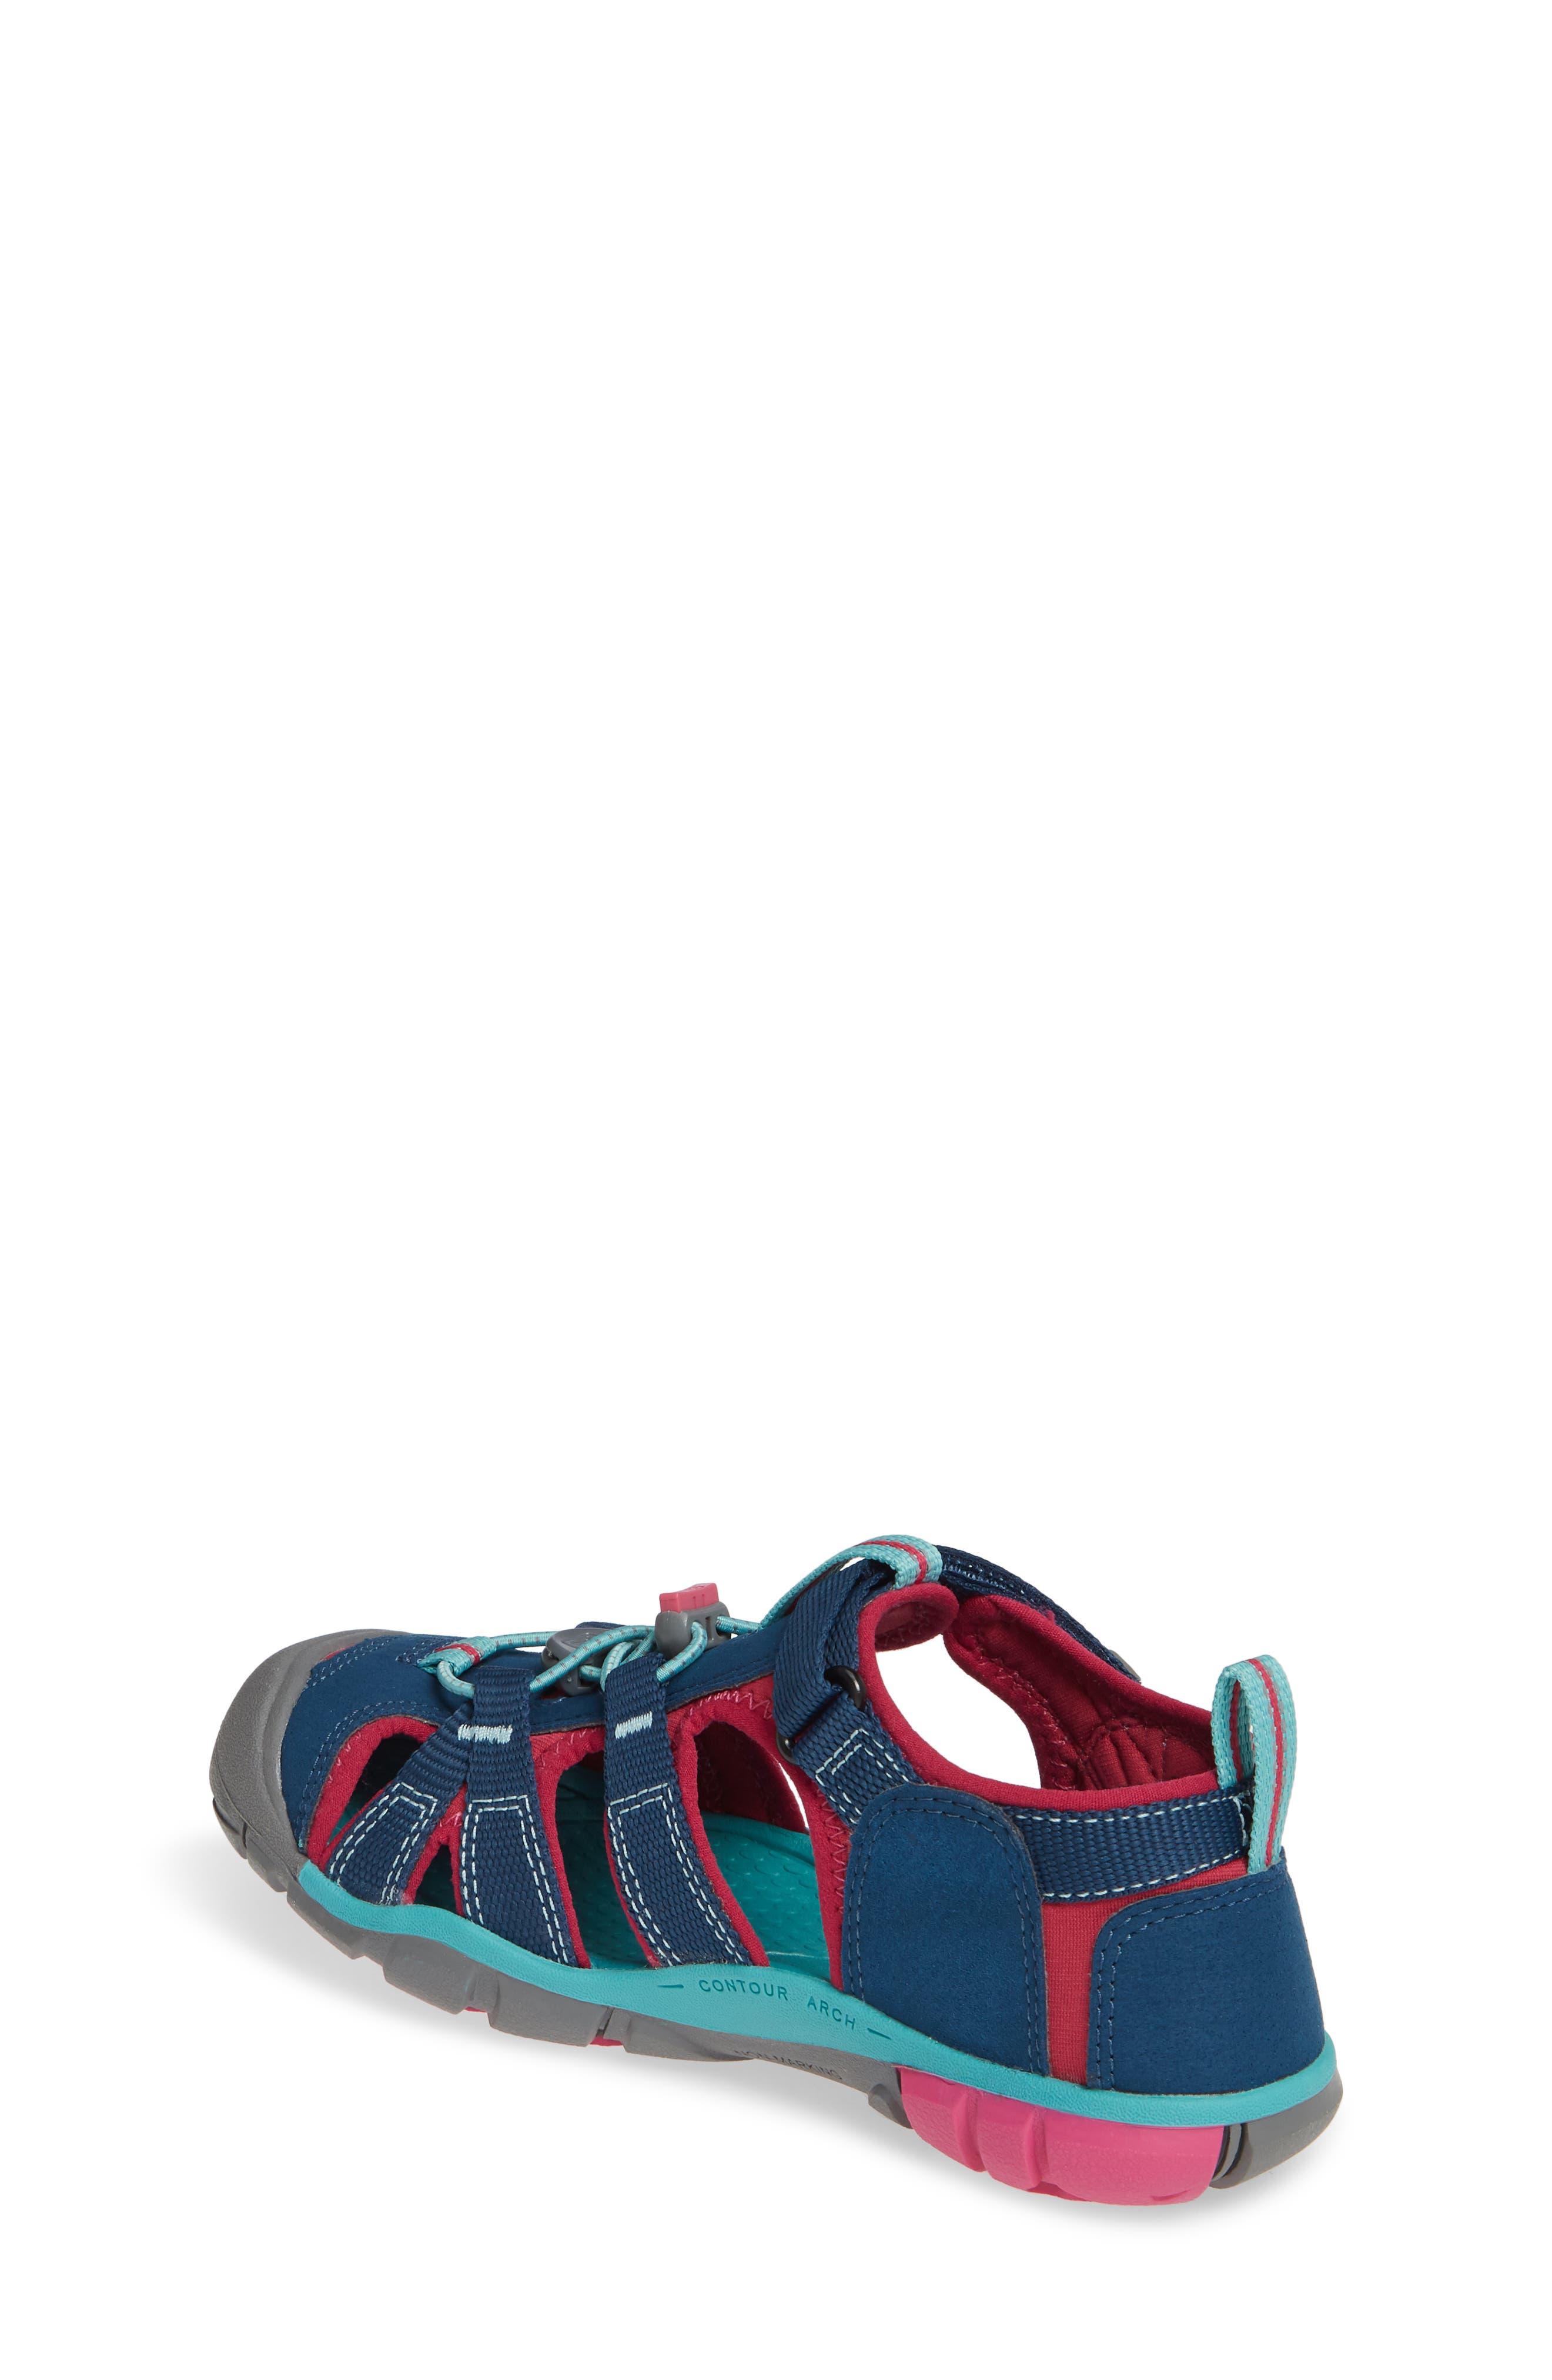 ,                             'Seacamp II' Water Friendly Sandal,                             Alternate thumbnail 45, color,                             408